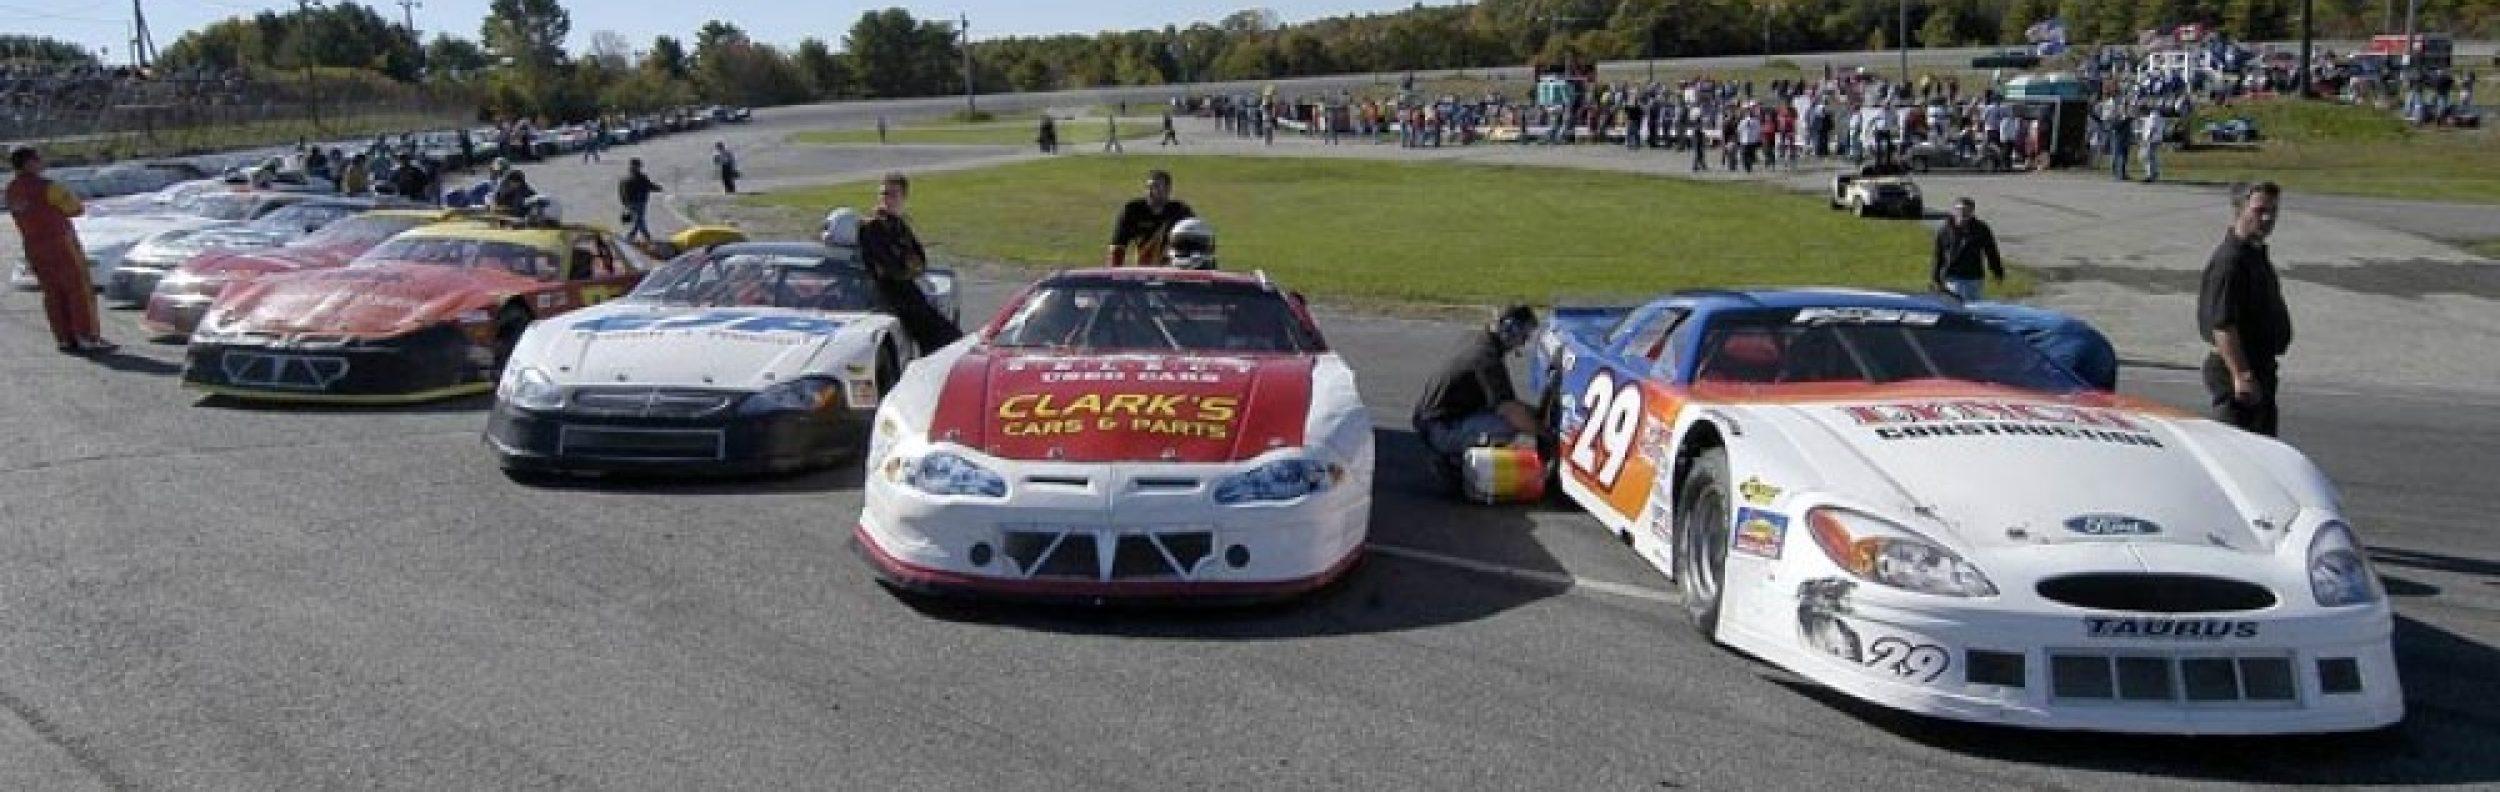 Cylinder Pro Rules Wiscasset Speedway